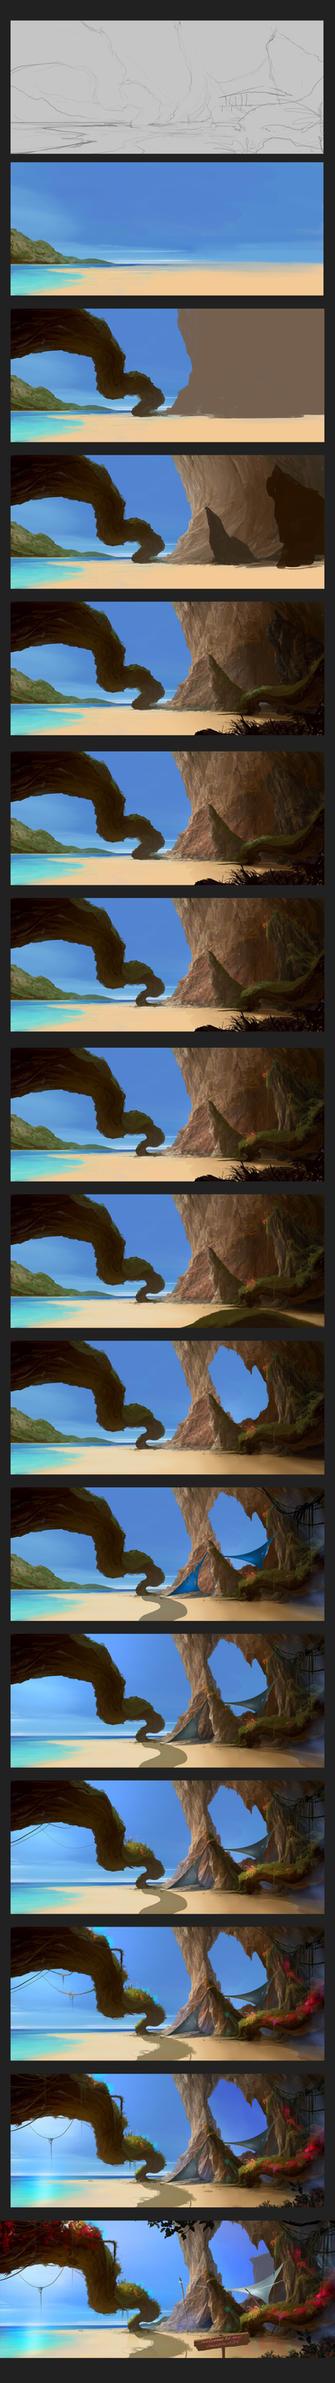 my imagination's process by Sergey-Lesiuk